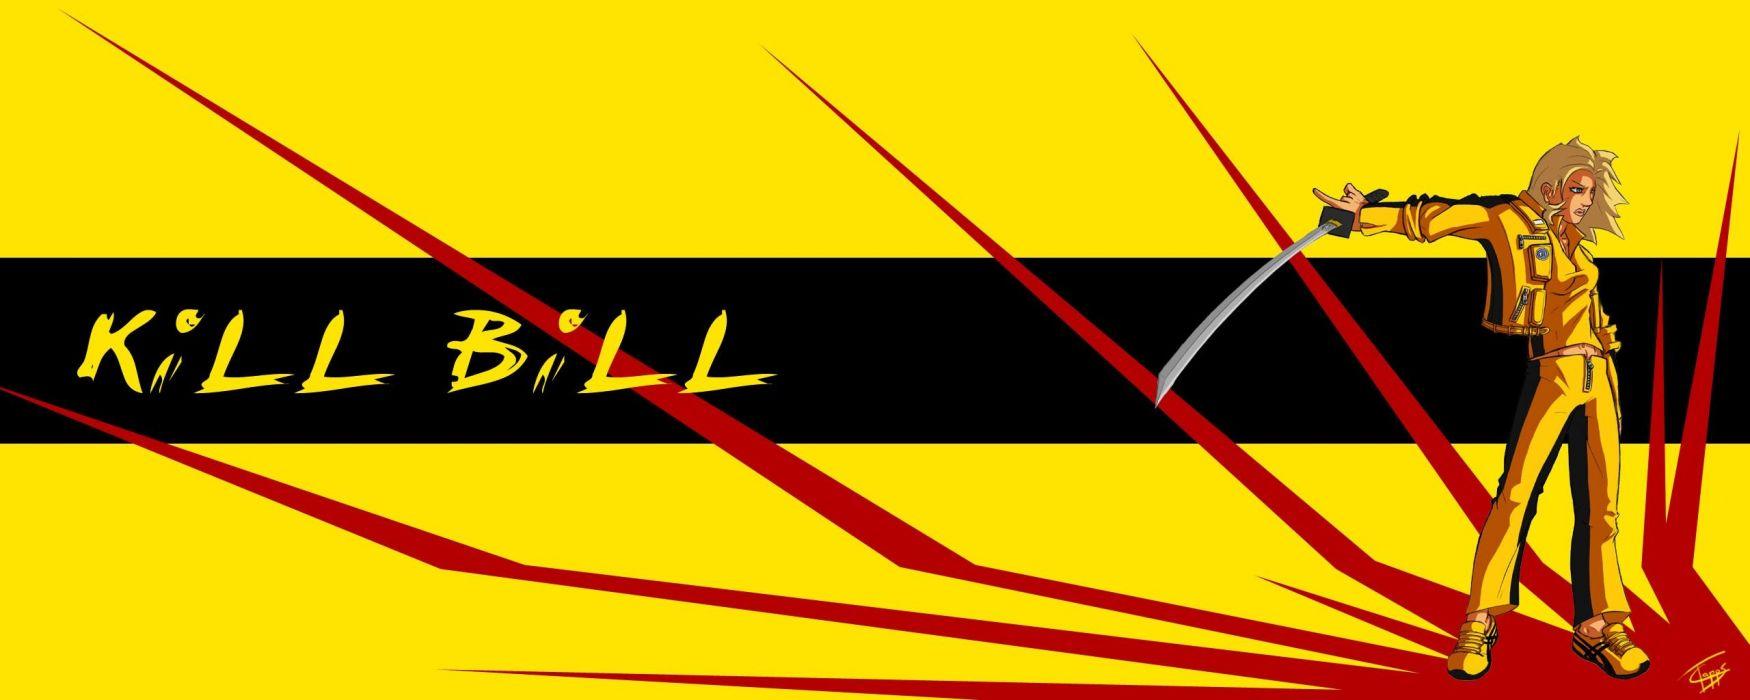 KILL BILL action crime martial arts warrior weapon katana sword poster    g wallpaper